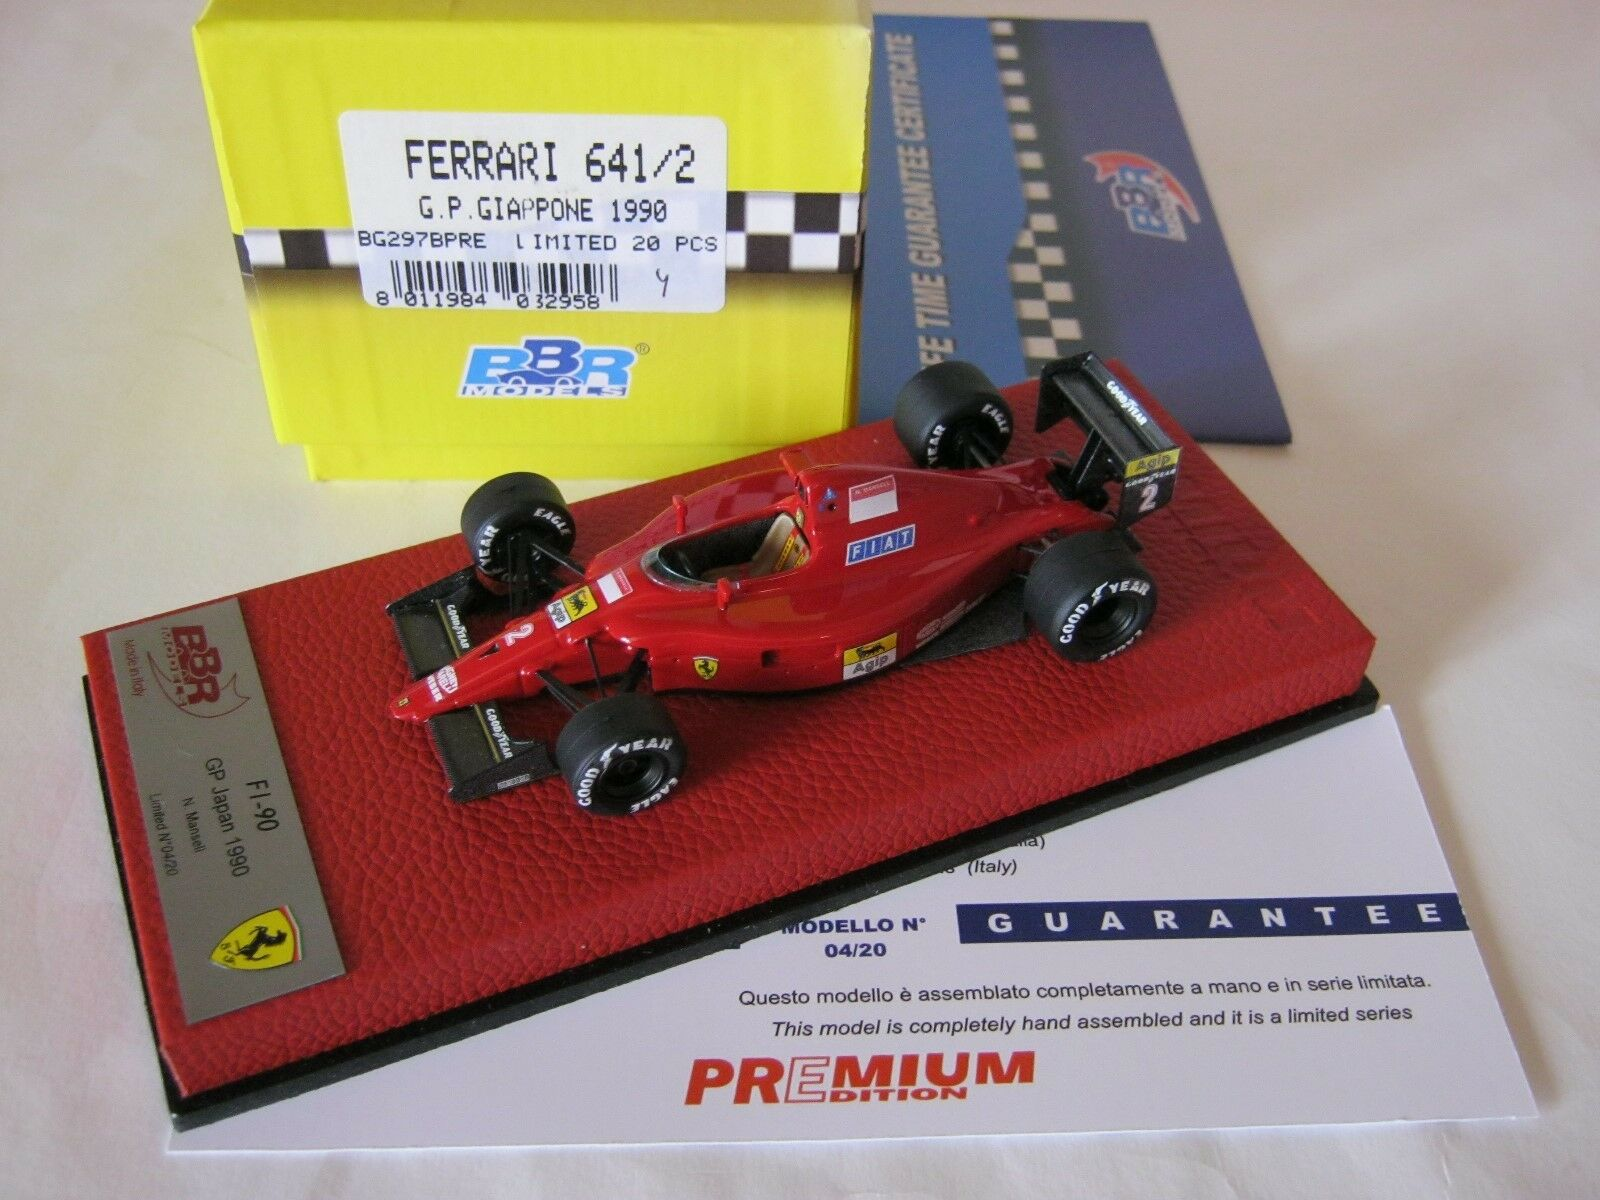 F1 BBR 1 43 FERRARI 641 2 GP JAPON 1990 BG297BPRE NIGEL MANSELL